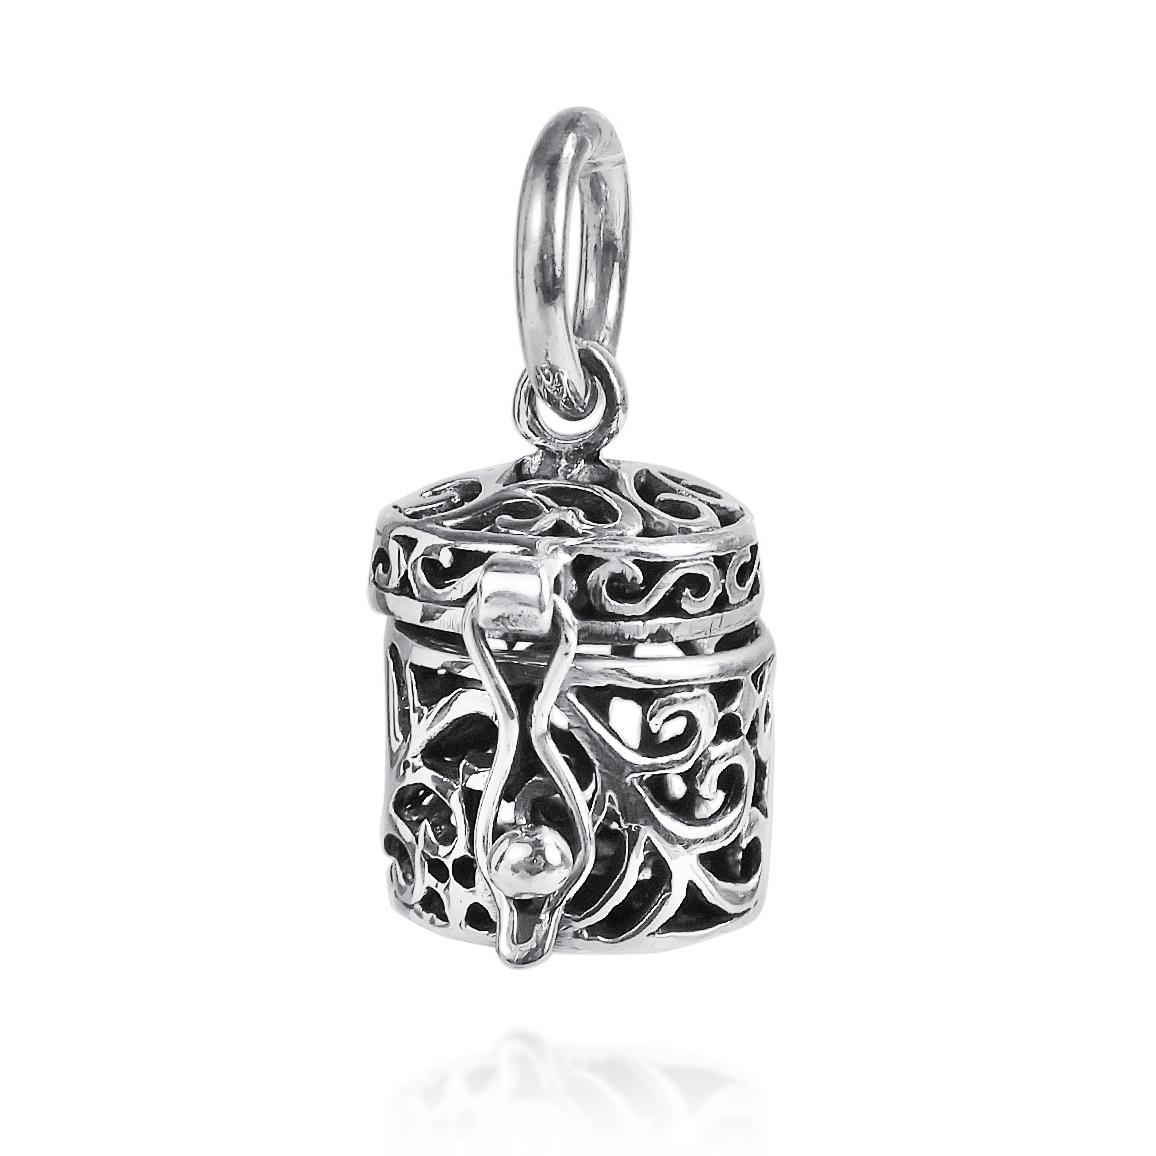 See through filigree ornate prayer box925 silver pendant or charm product product product product product product this sterling silver prayer box pendant aloadofball Gallery